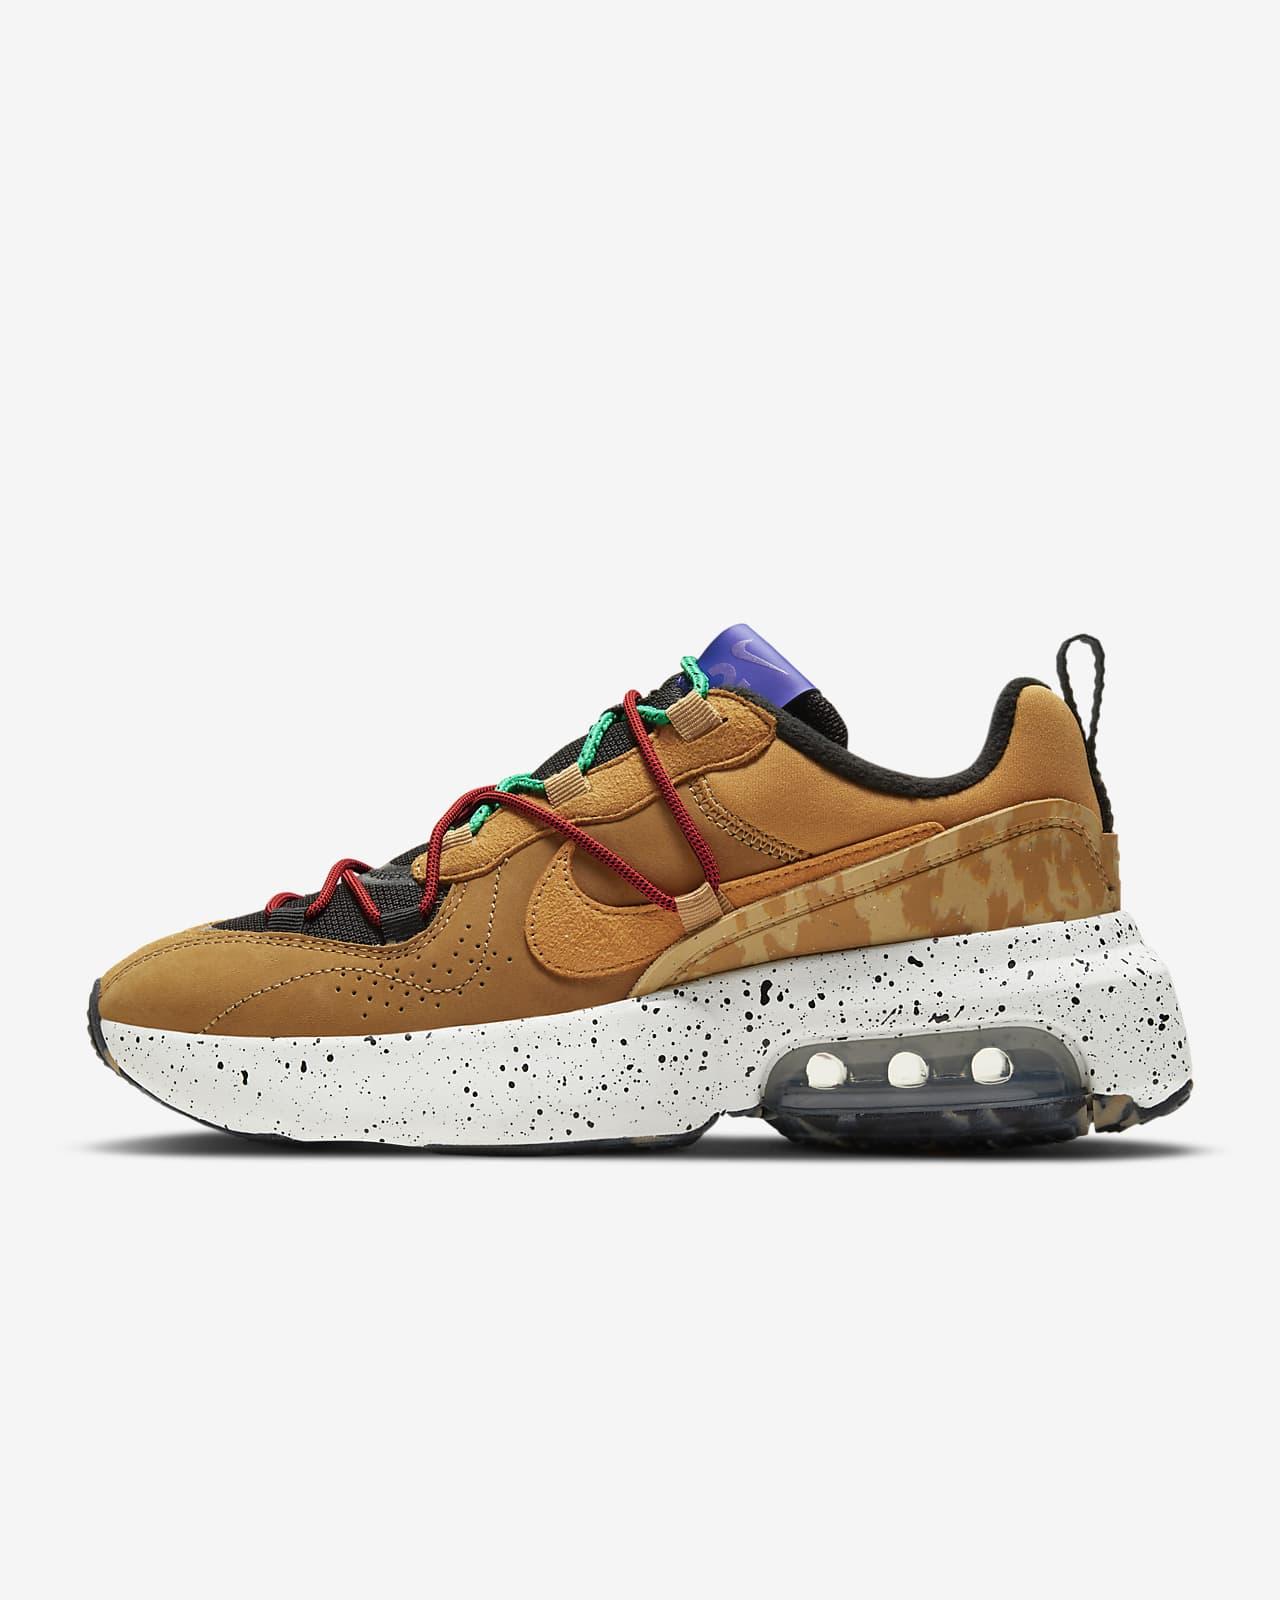 Nike Air Max Viva Women's Shoes. Nike LU